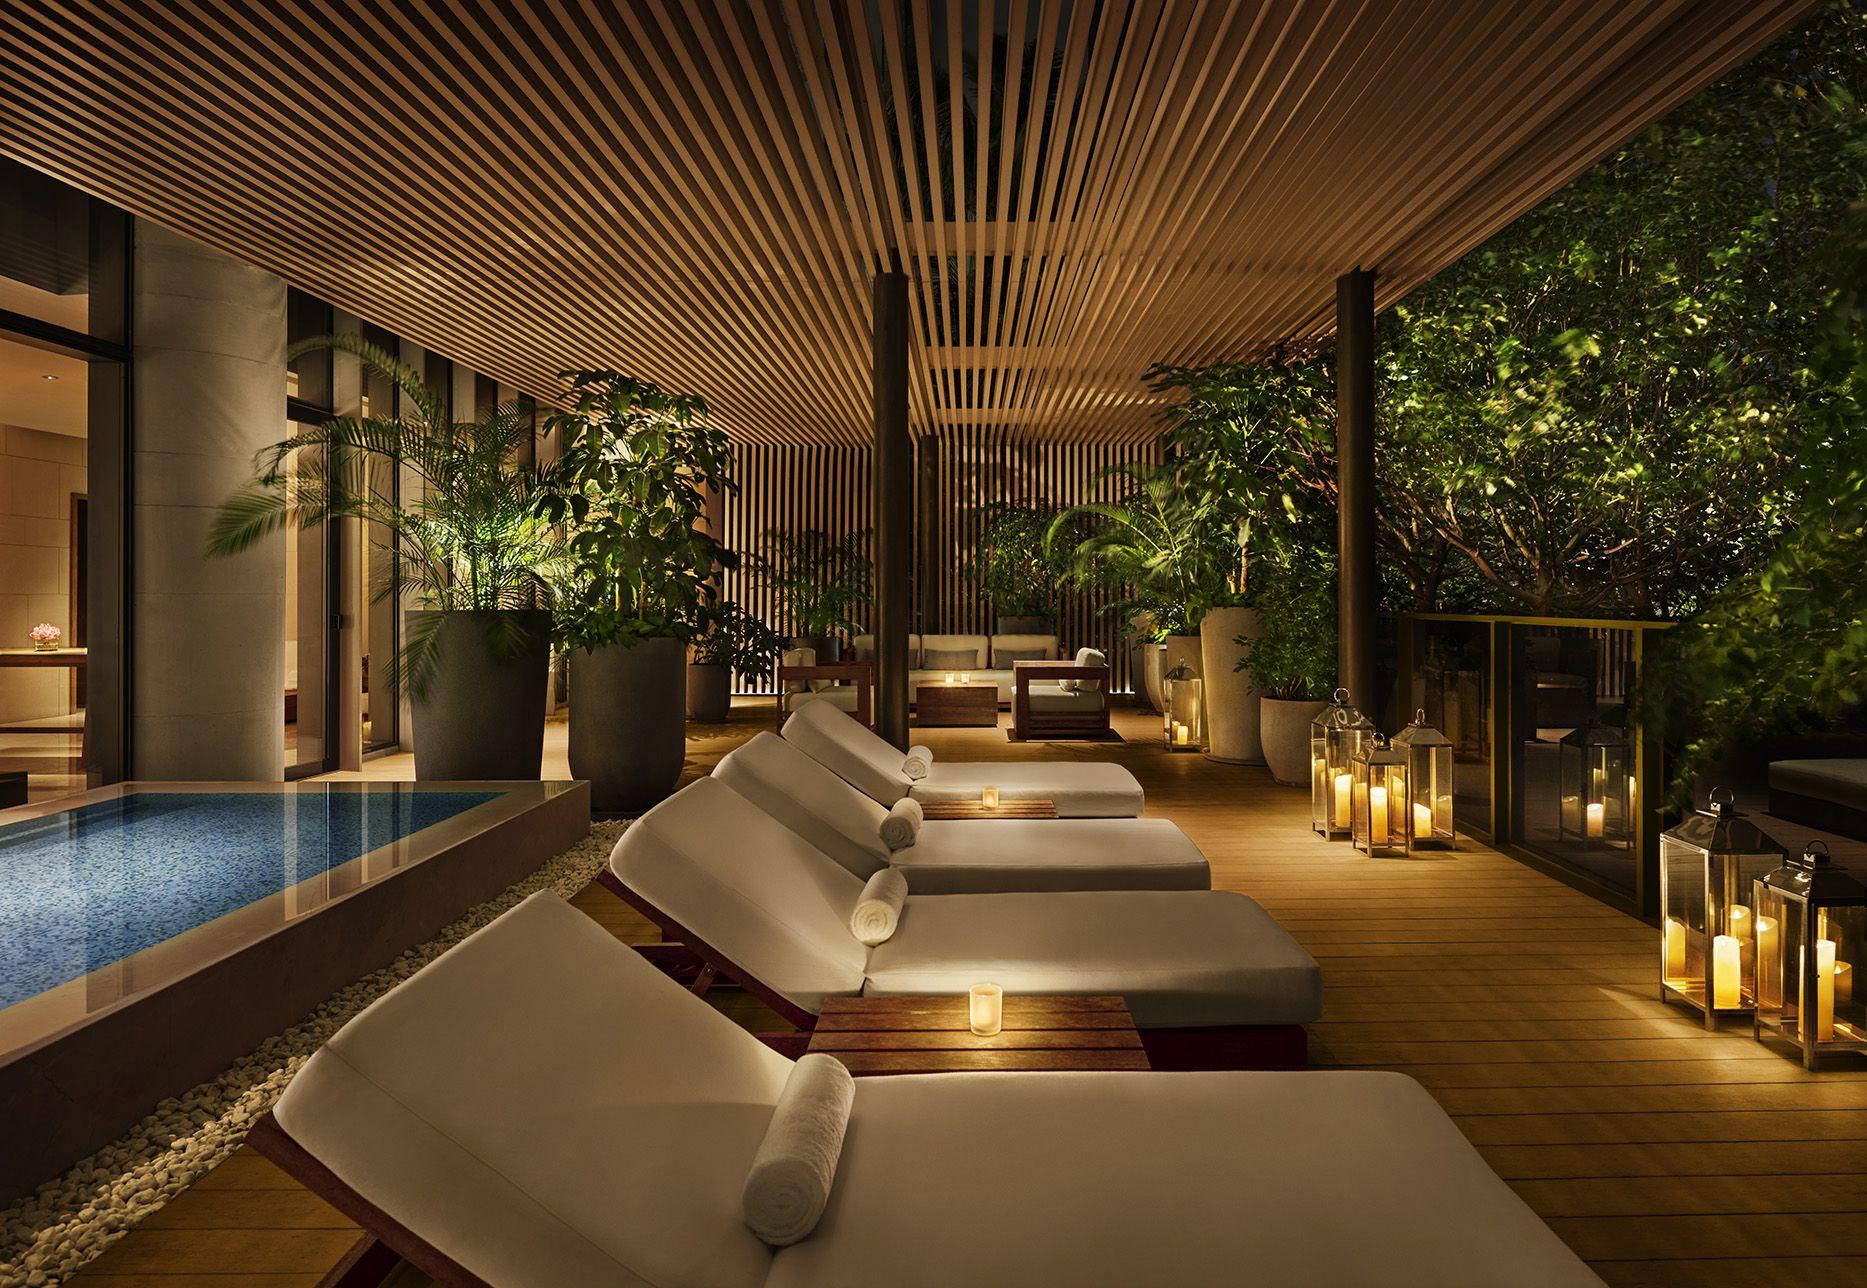 The Sanya Edition Spa Lounge Spa Decor Spa Rooms